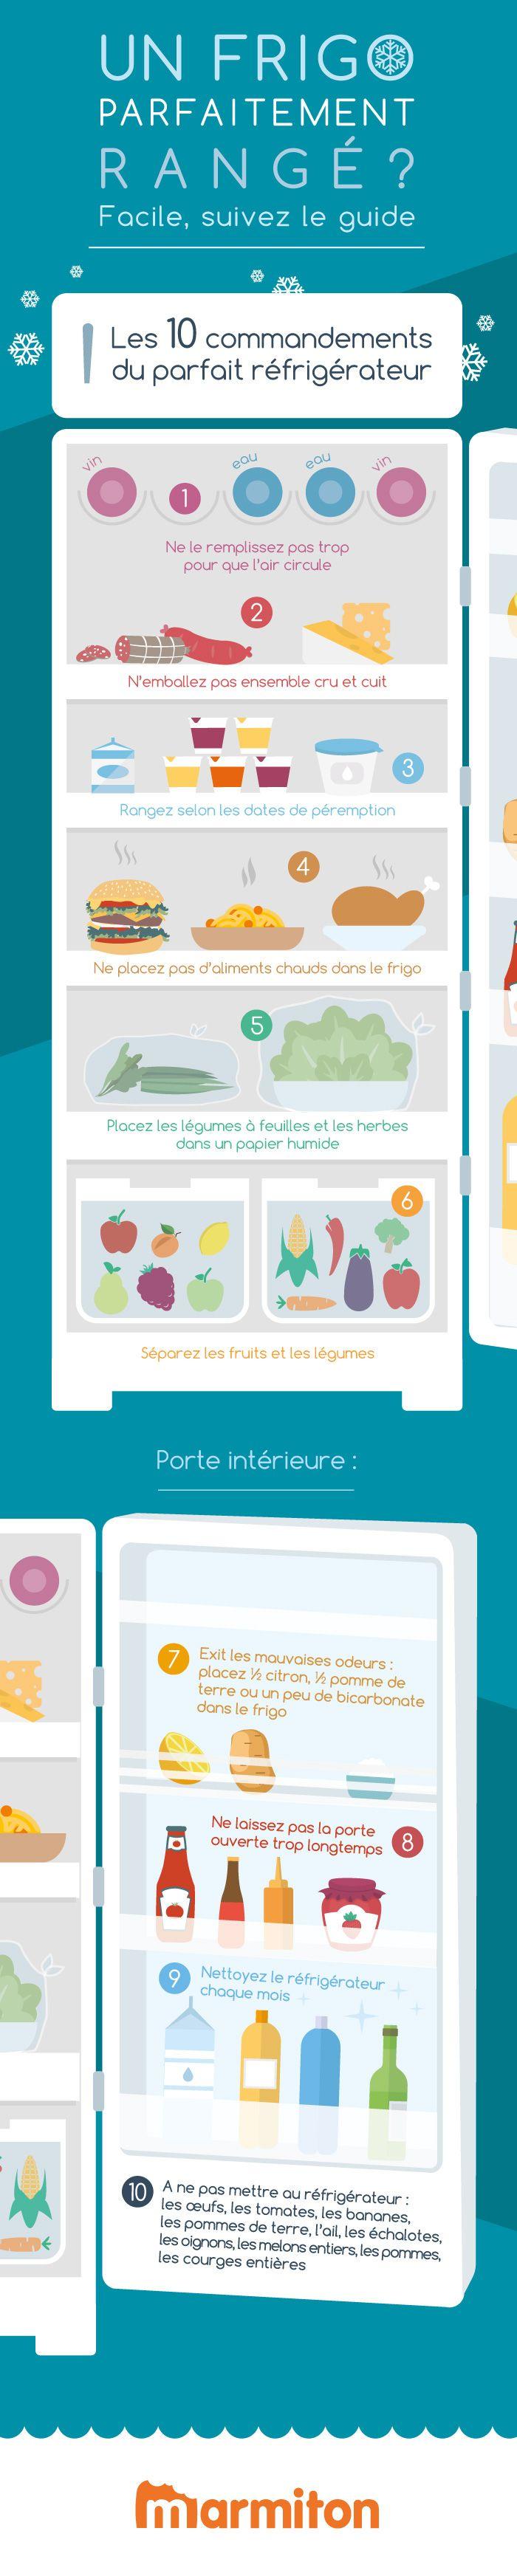 Infographie : Bien ranger son frigo